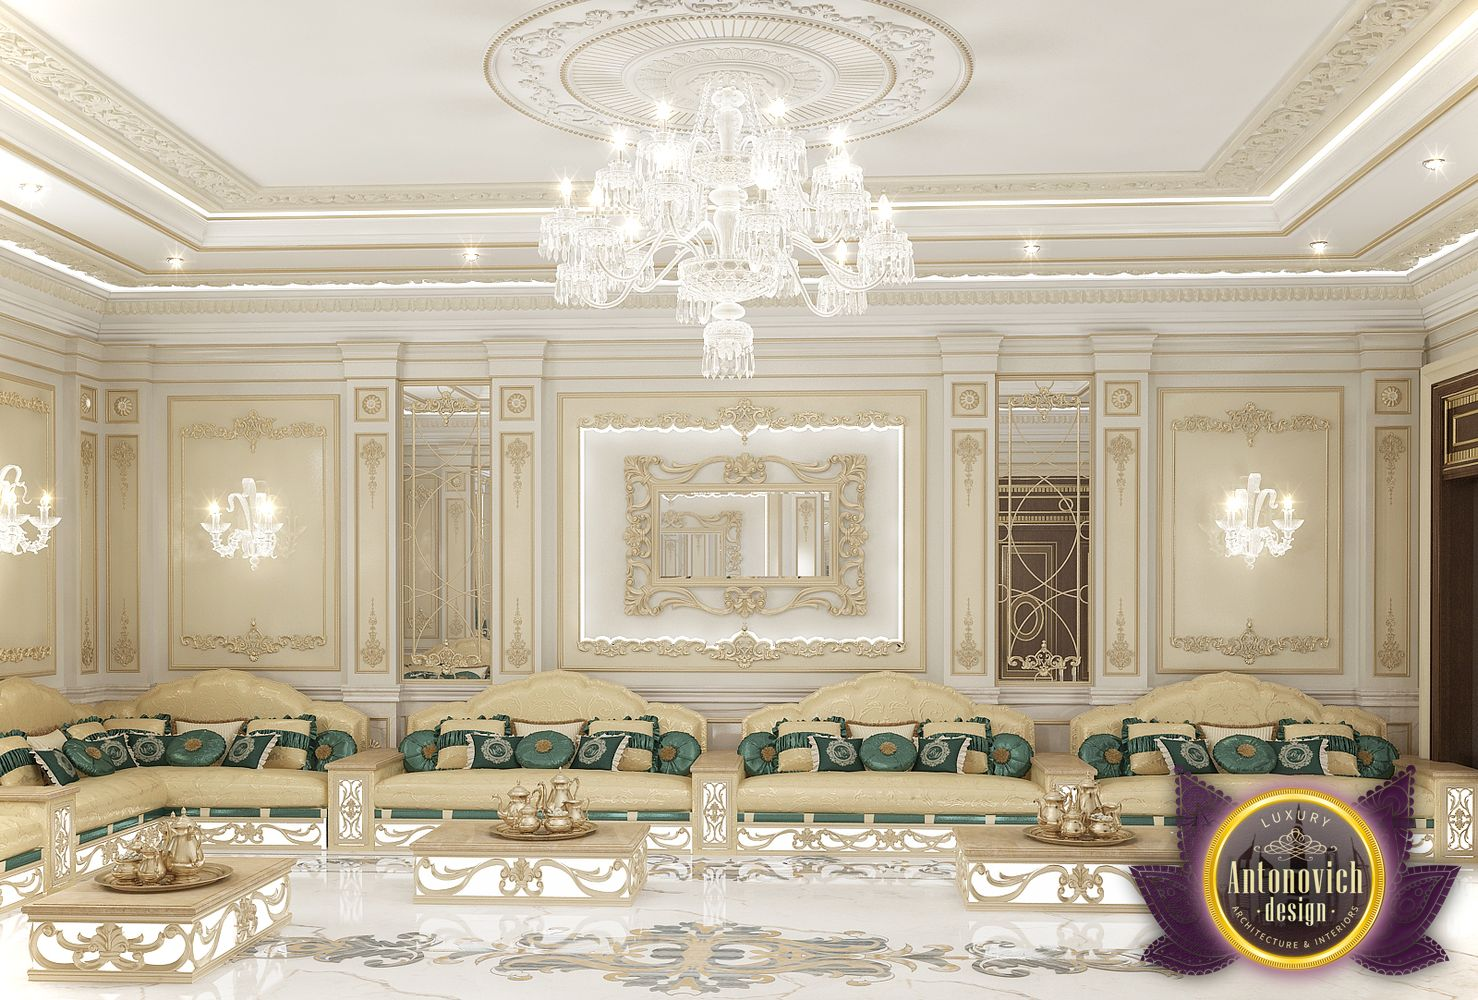 nigeiradesign: Arabic Majlis Interior Design from Luxury ...